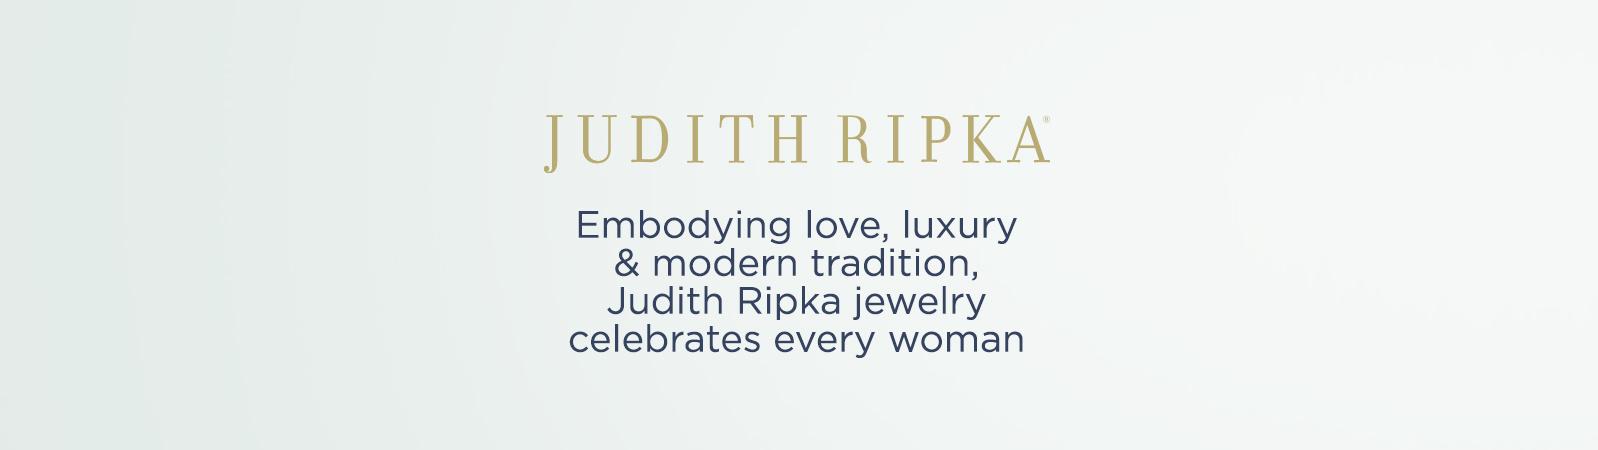 Judith Ripka -- Embodying love, luxury & modern tradition, Judith Ripka jewelry celebrates every woman